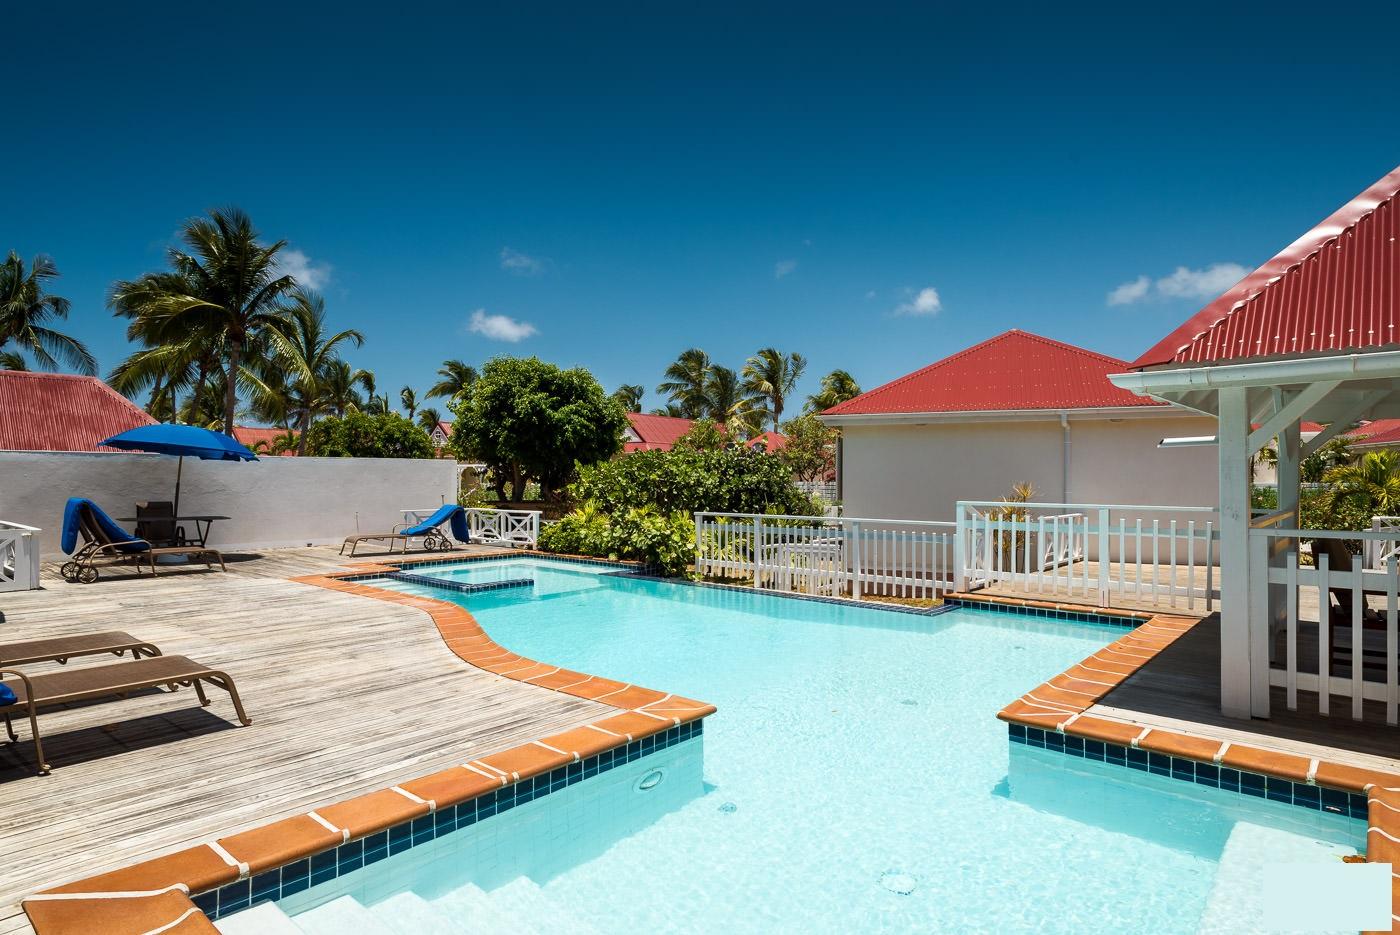 Beachfront St Barts Luxury Villa Vacation Rentals St